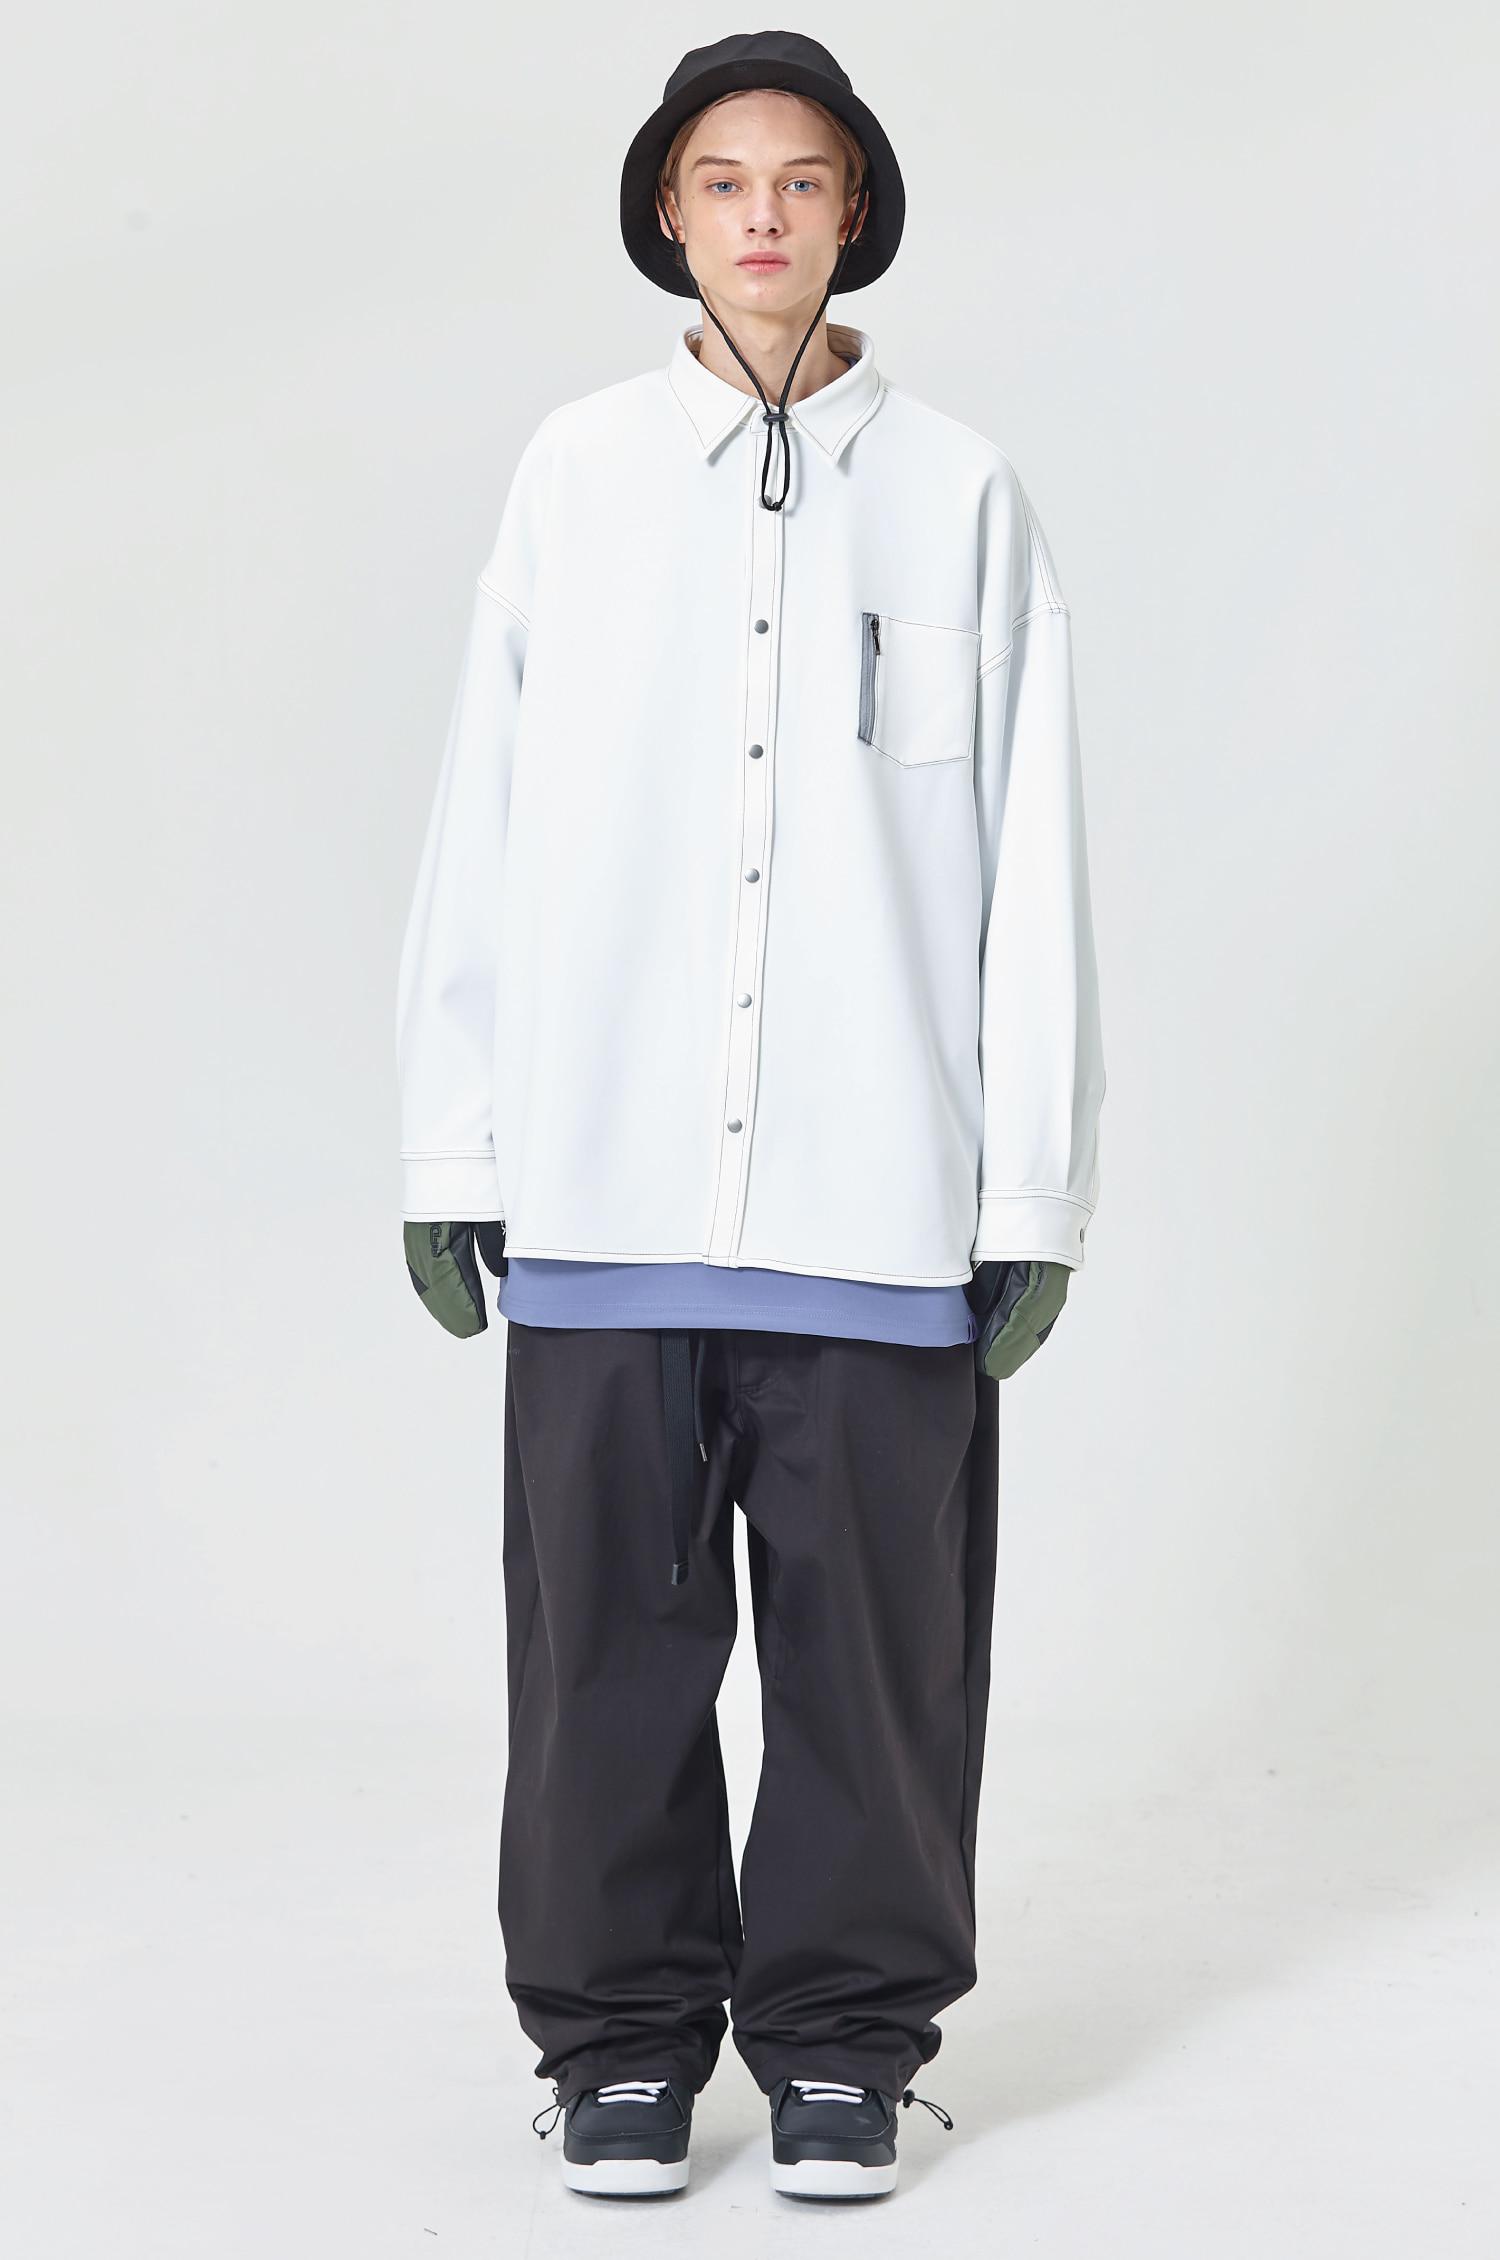 SET 17 - SHIRKET / PANTS